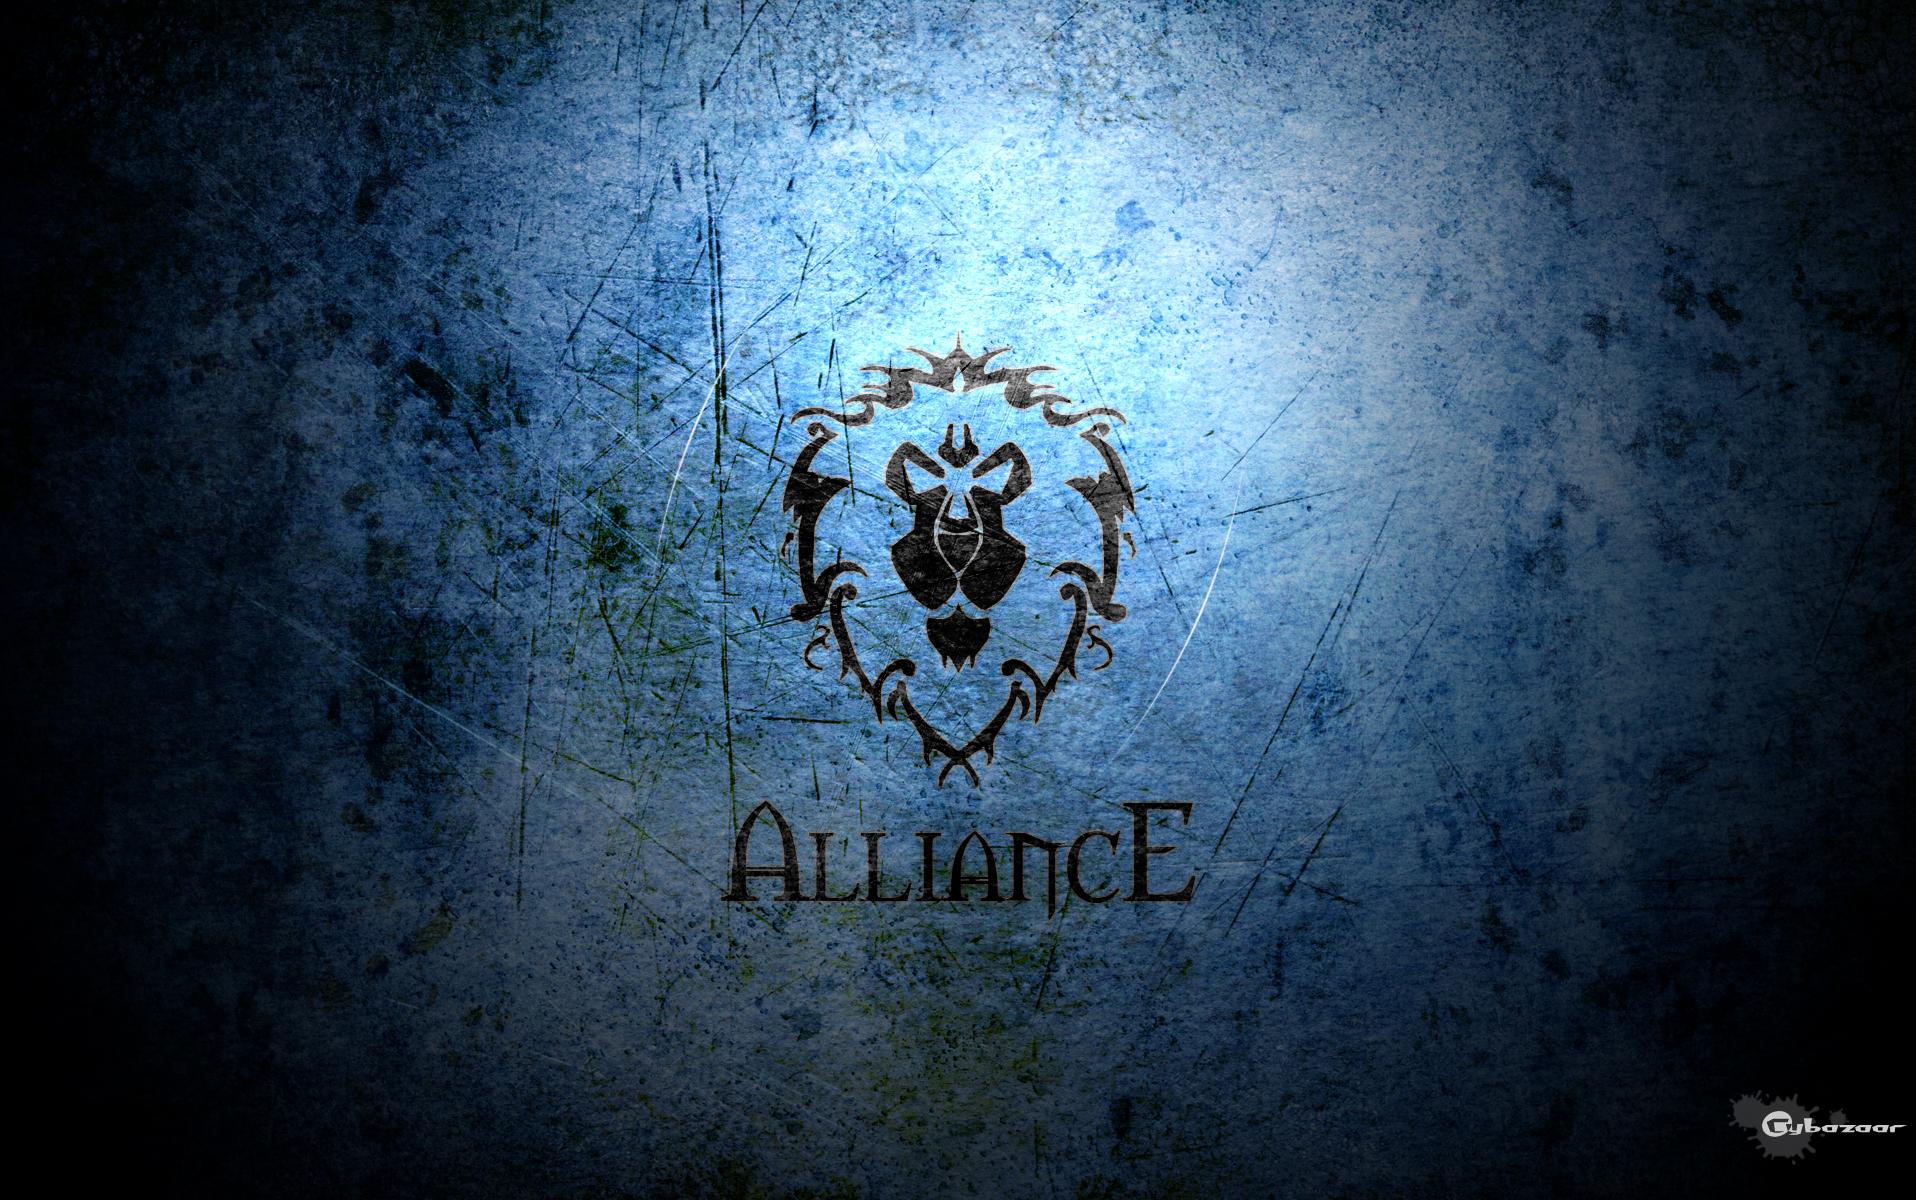 Alliance Wallpaper